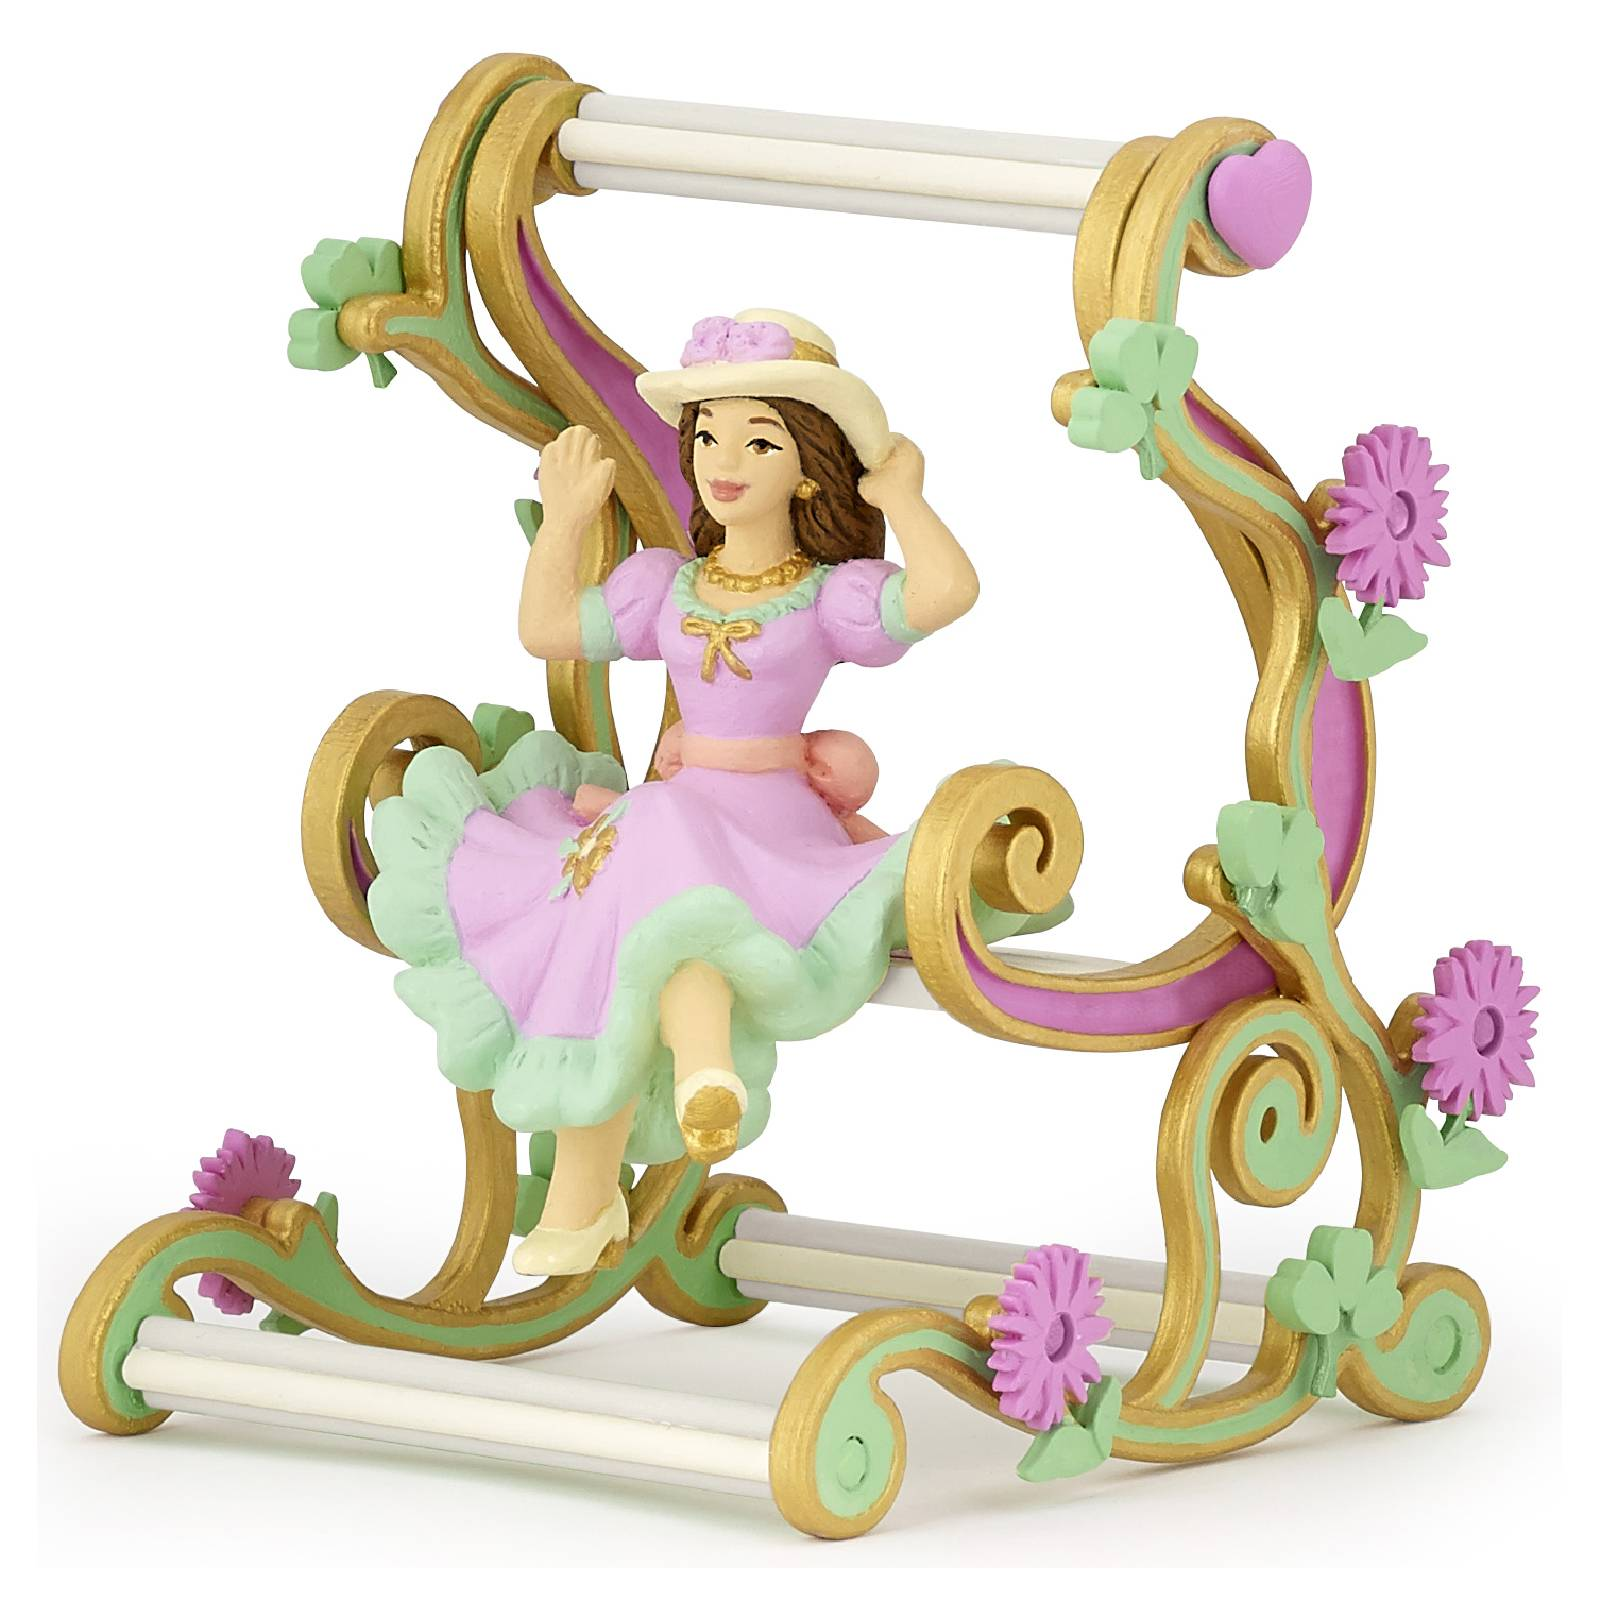 Papo Enchanted World: Princess on Swing Chair